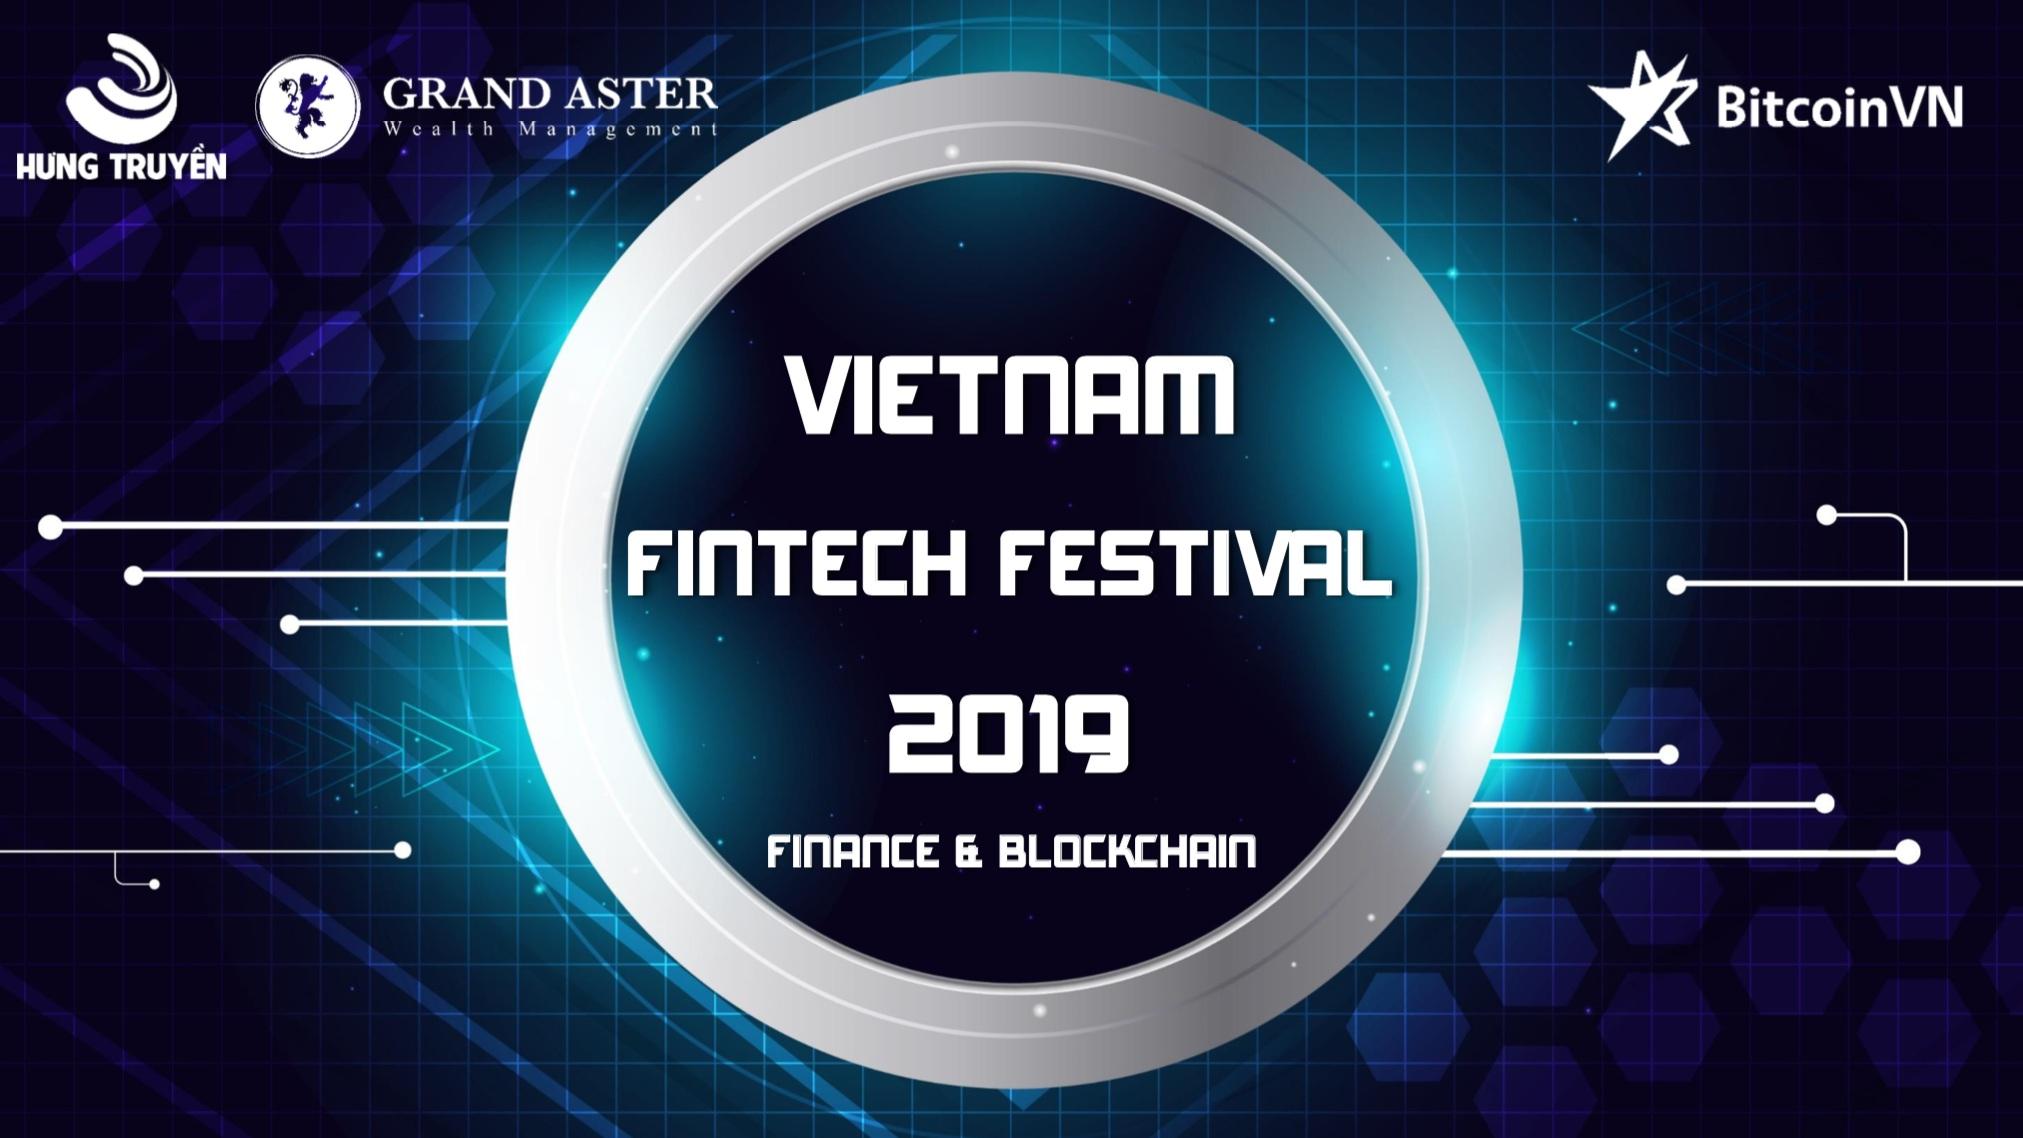 For more information, visit  www.fintechfestival.vn